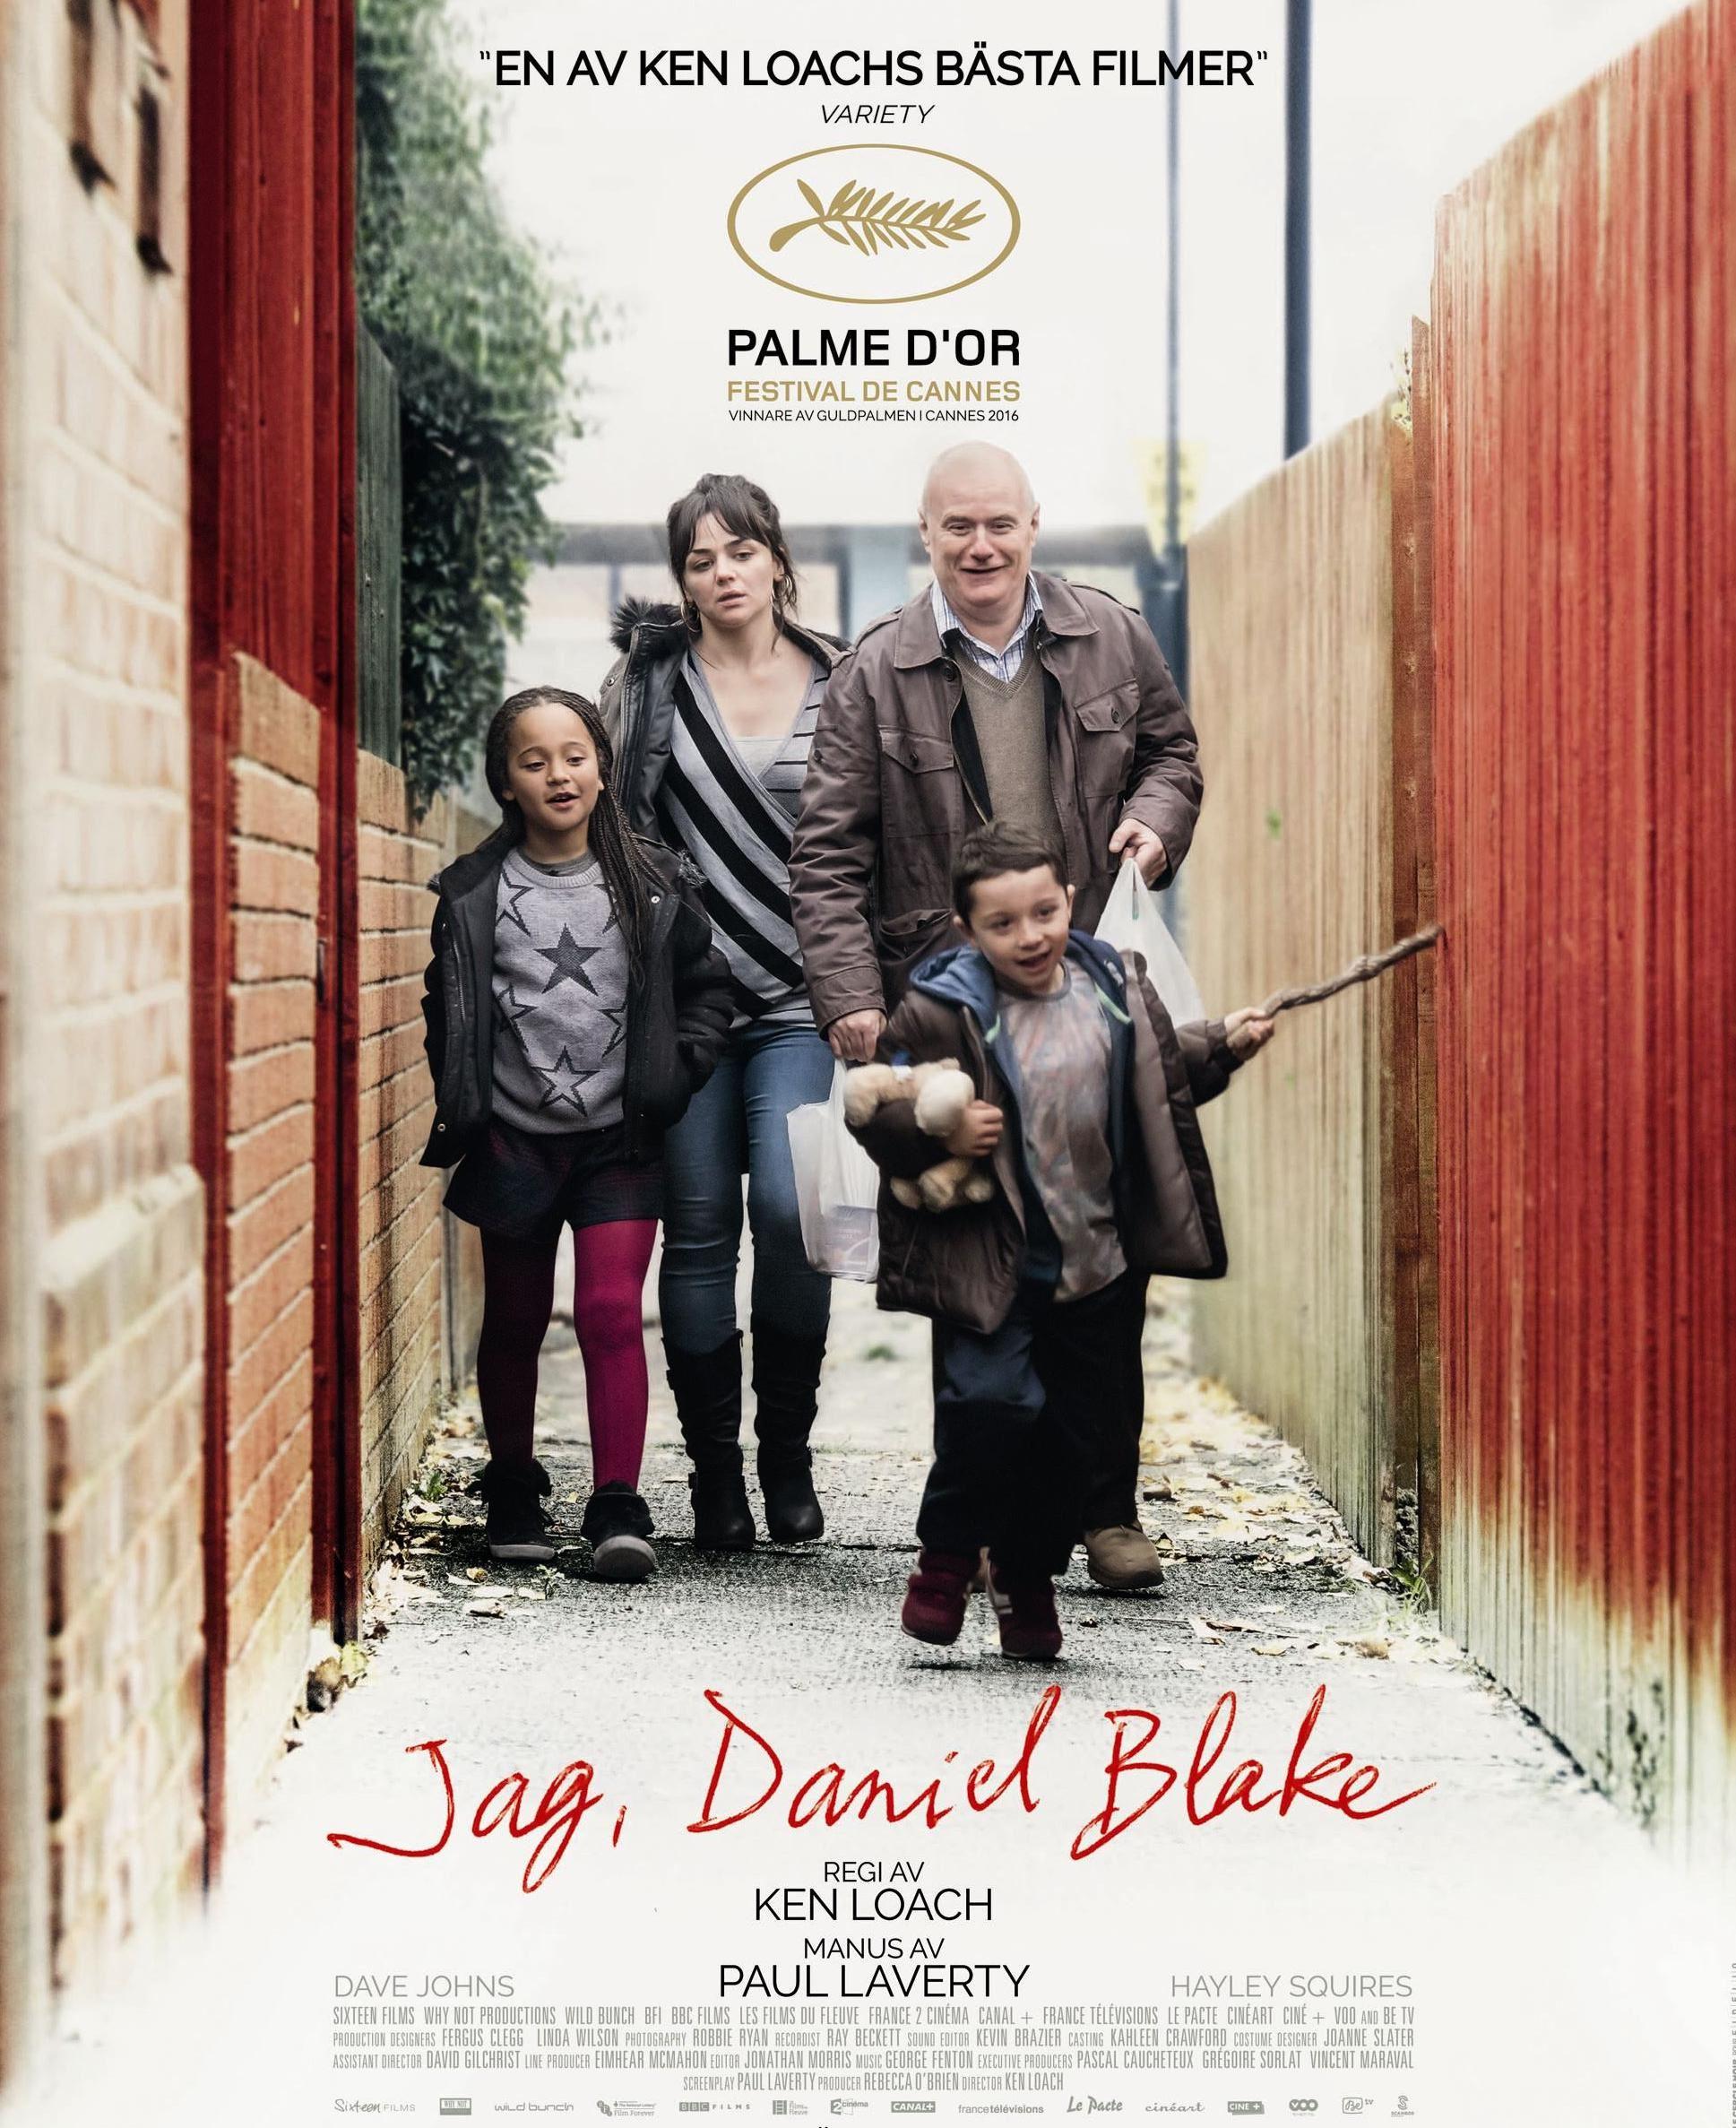 Bio - Jag, Daniel Blake